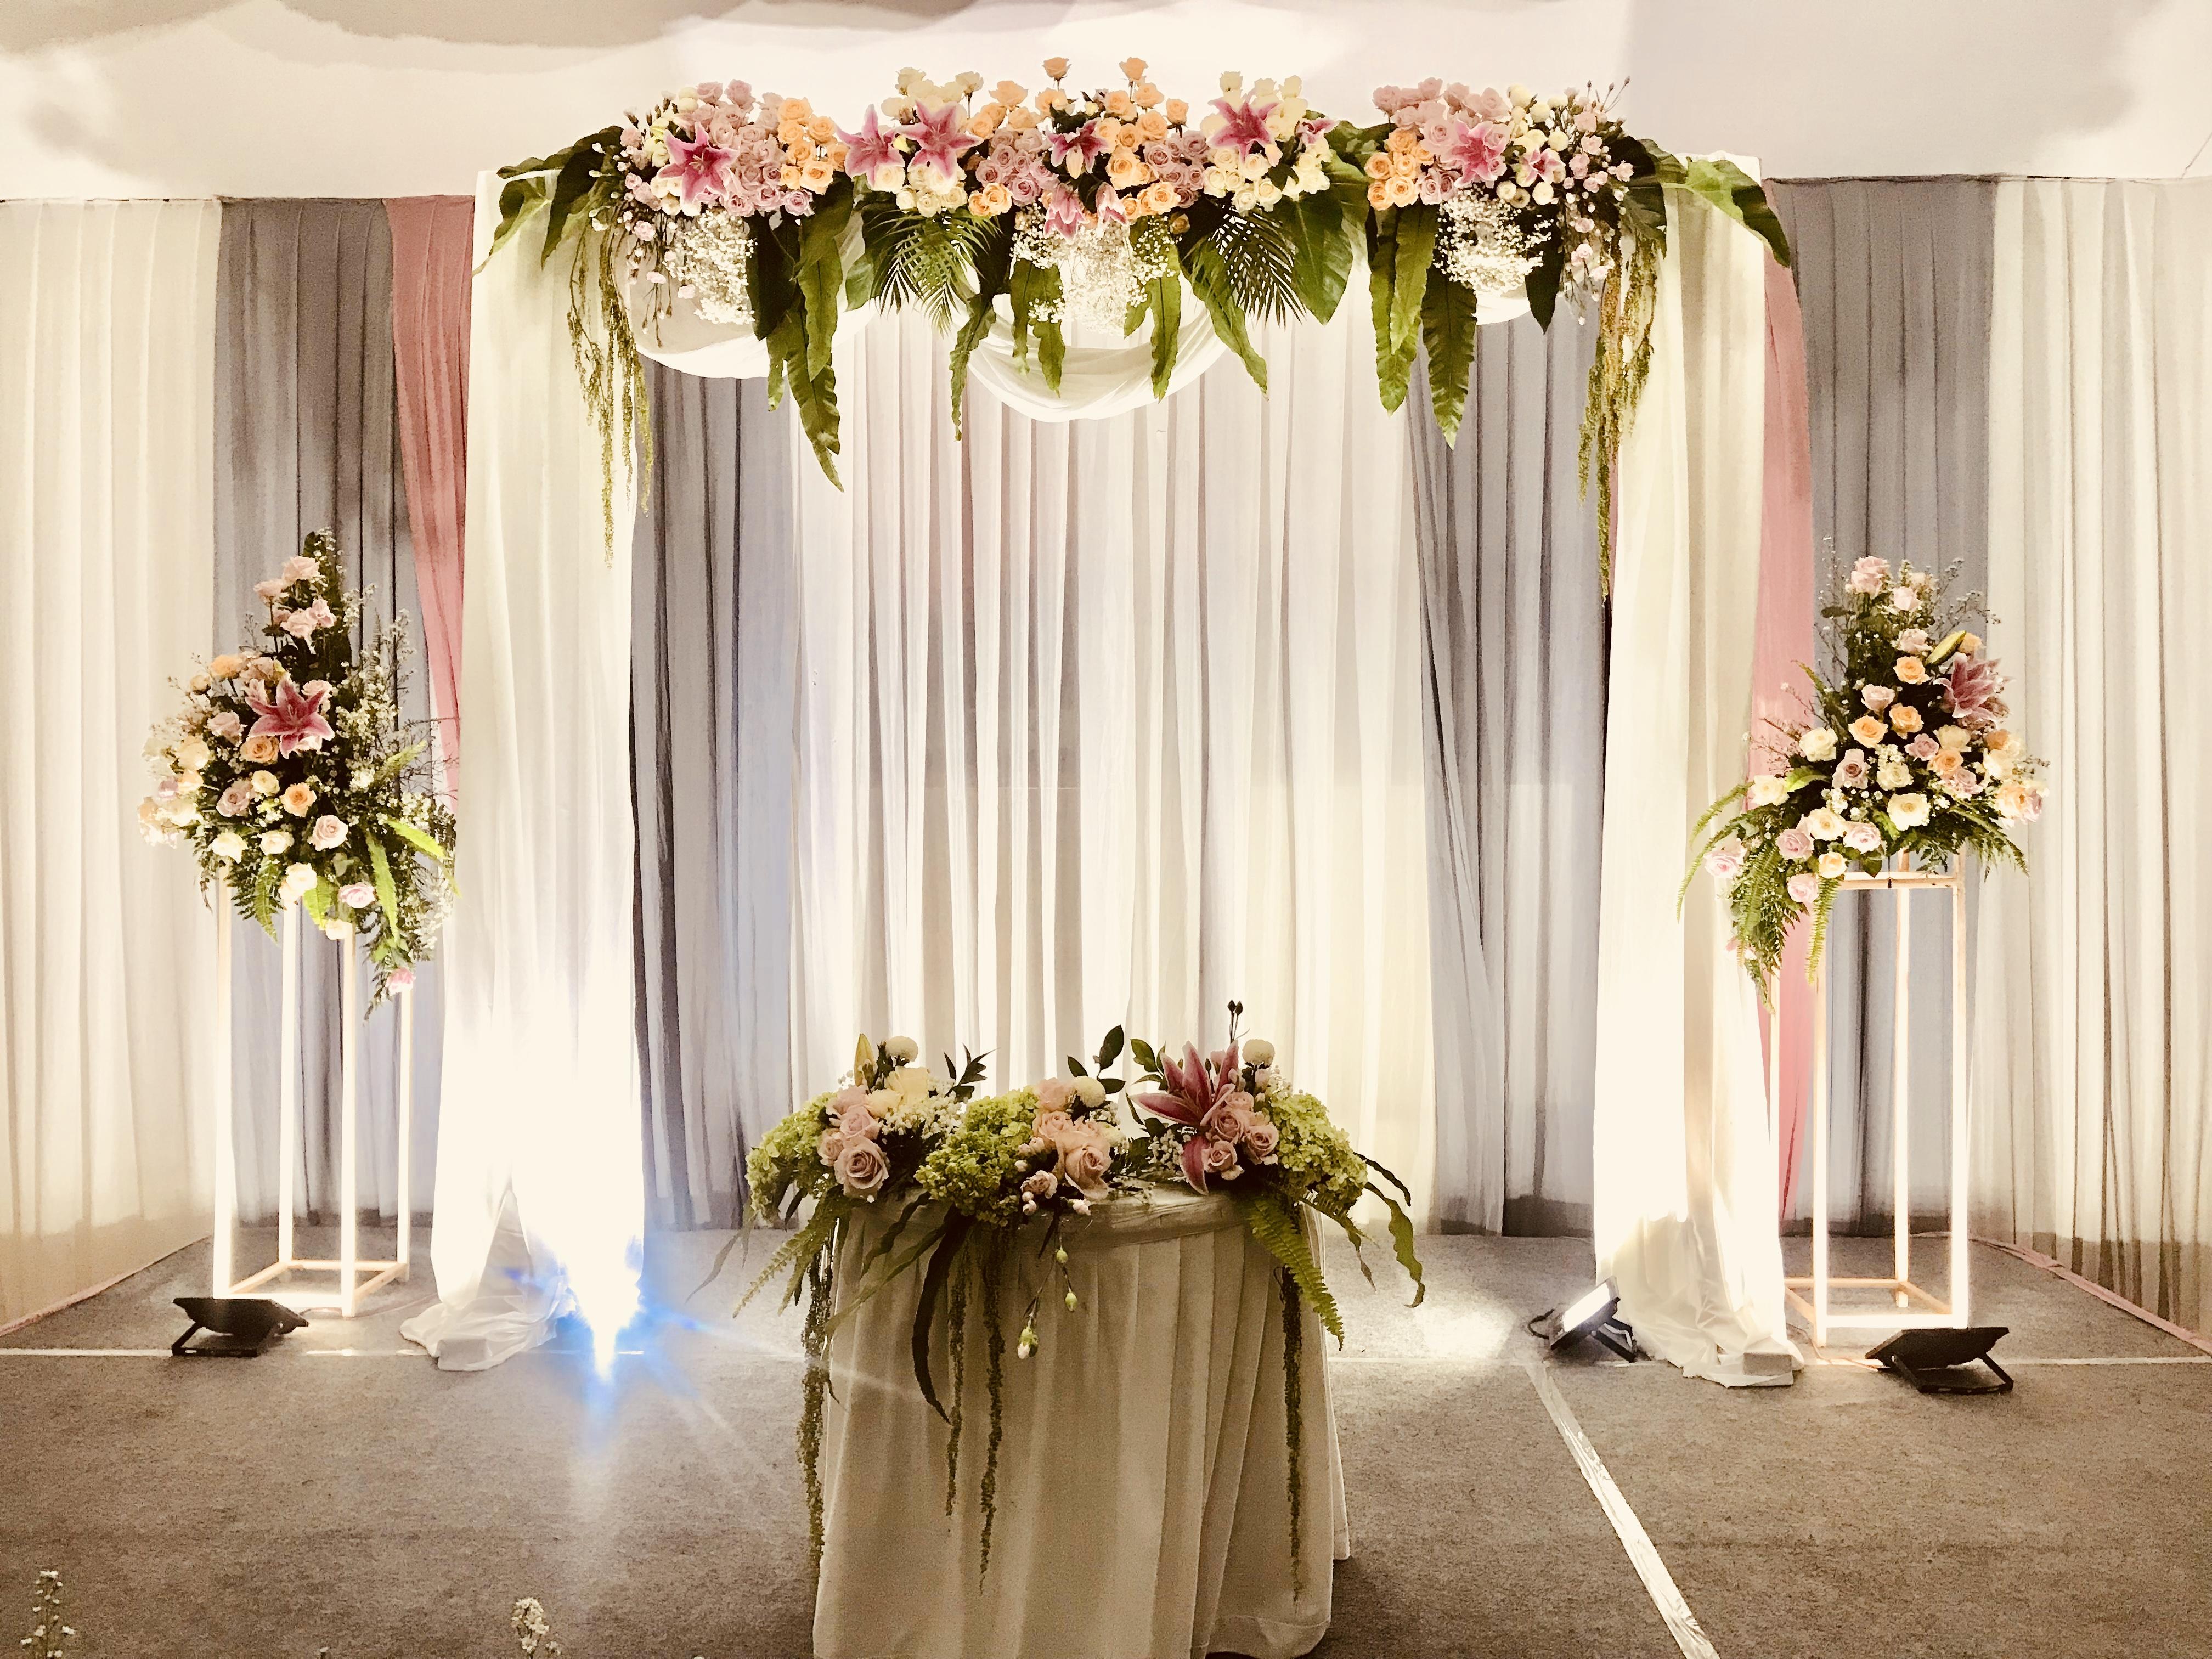 Mrs Purin Mr Toyo 25th Wedding Anniversary By Cassia Decoration